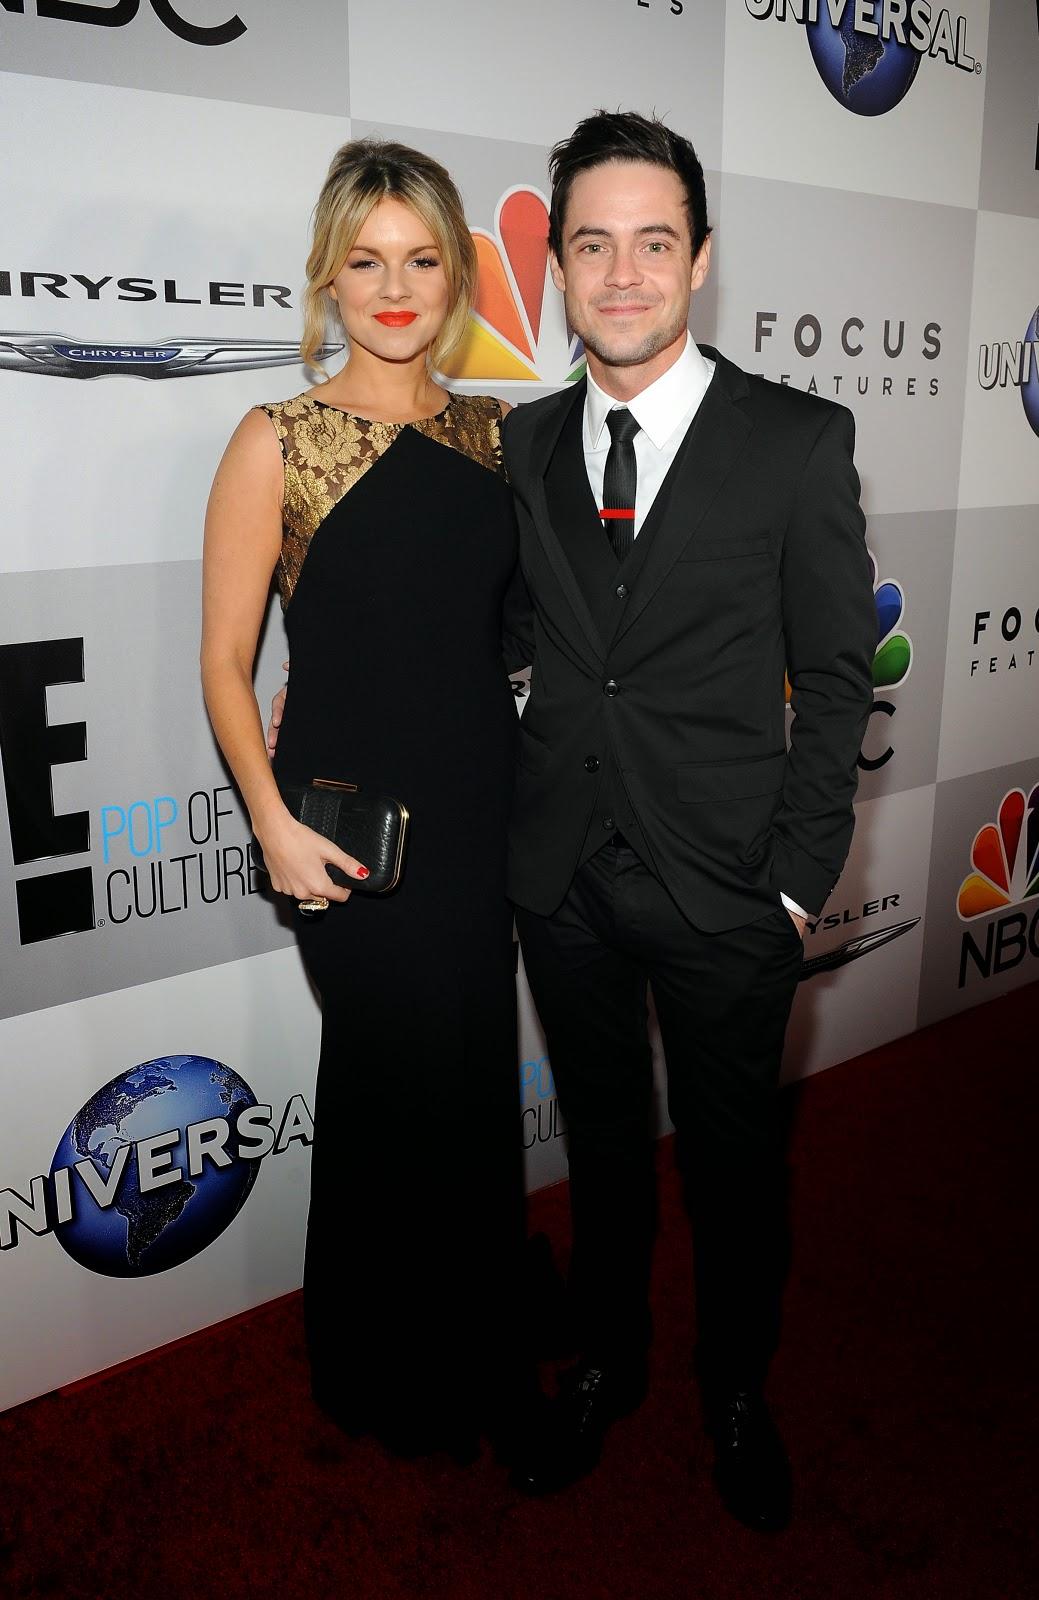 HD Wallpapers - Ali Fedotowsky HD Photos of MTV Video Music Awards Photos and Golden Globe Awards